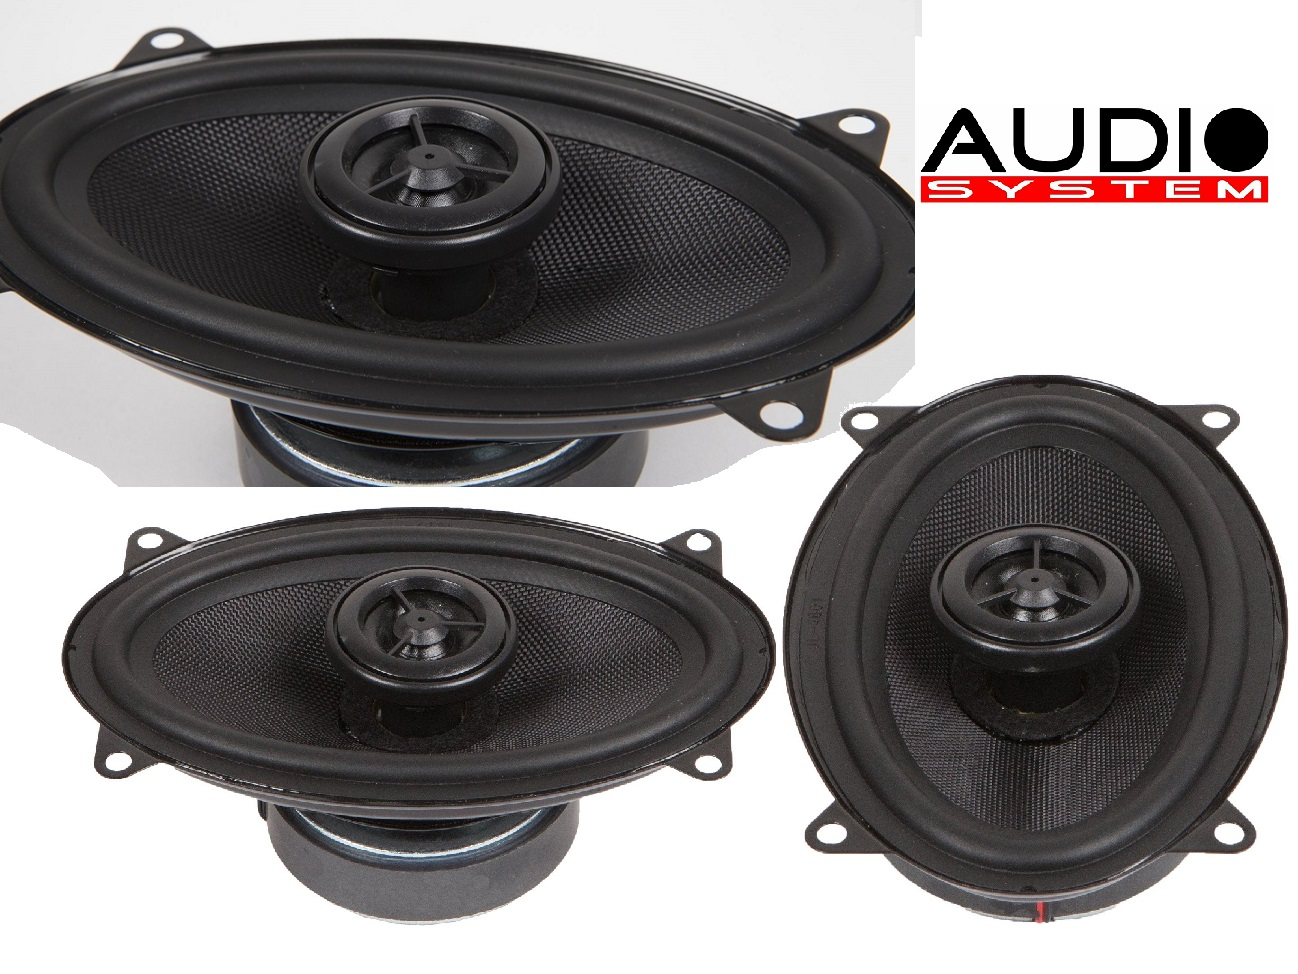 "AUDIO SYSTEM MXC 406 EVO 4x6"" Coaxial System Lautsprecher Speaker Koax 1 PAAR"